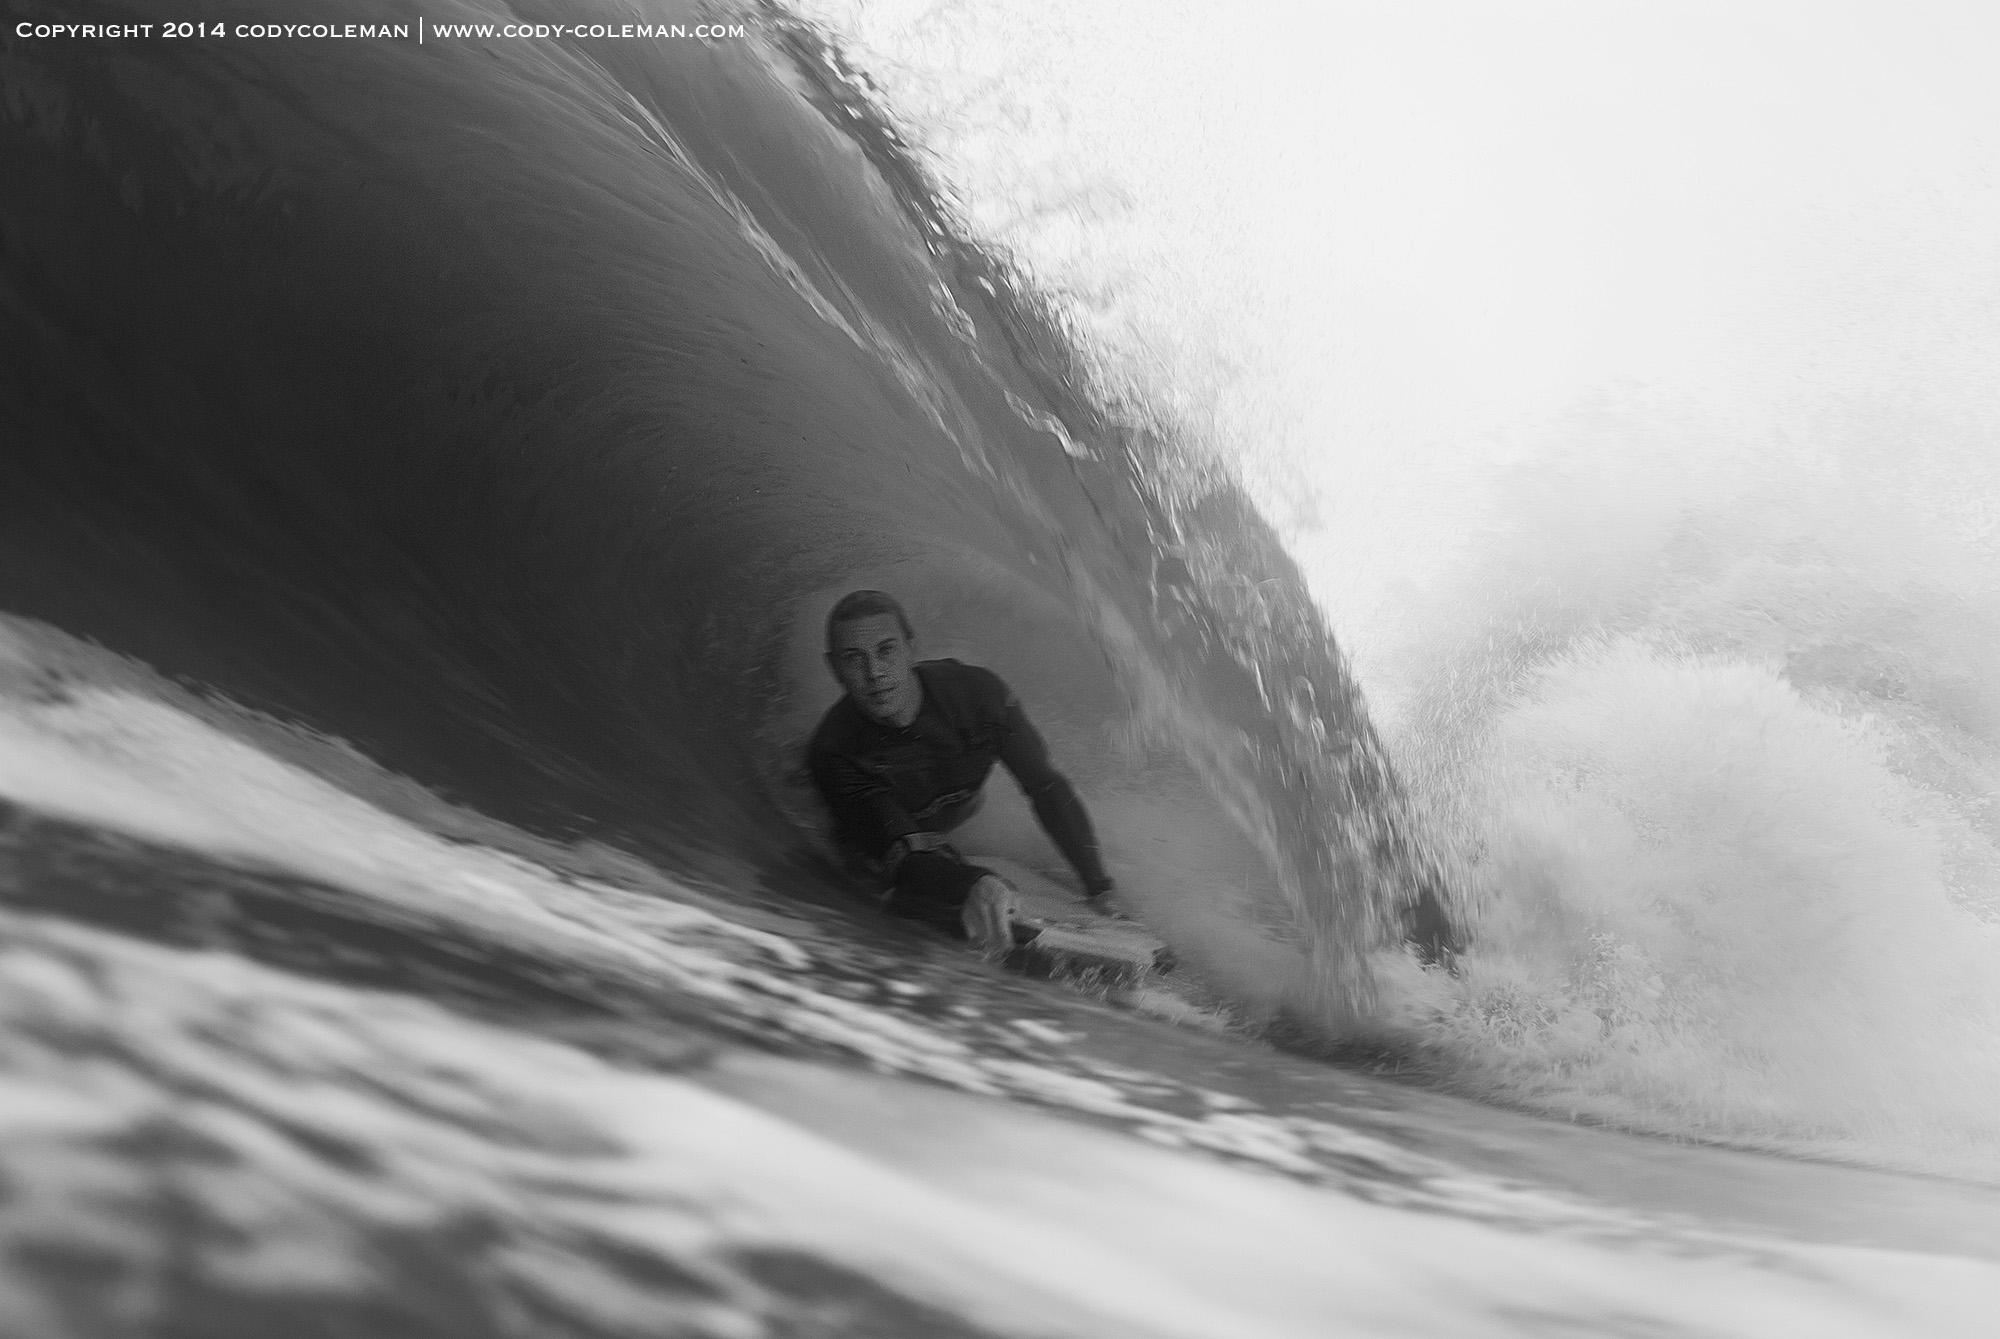 St_Augustine_bodyboarding_billy_Anderson